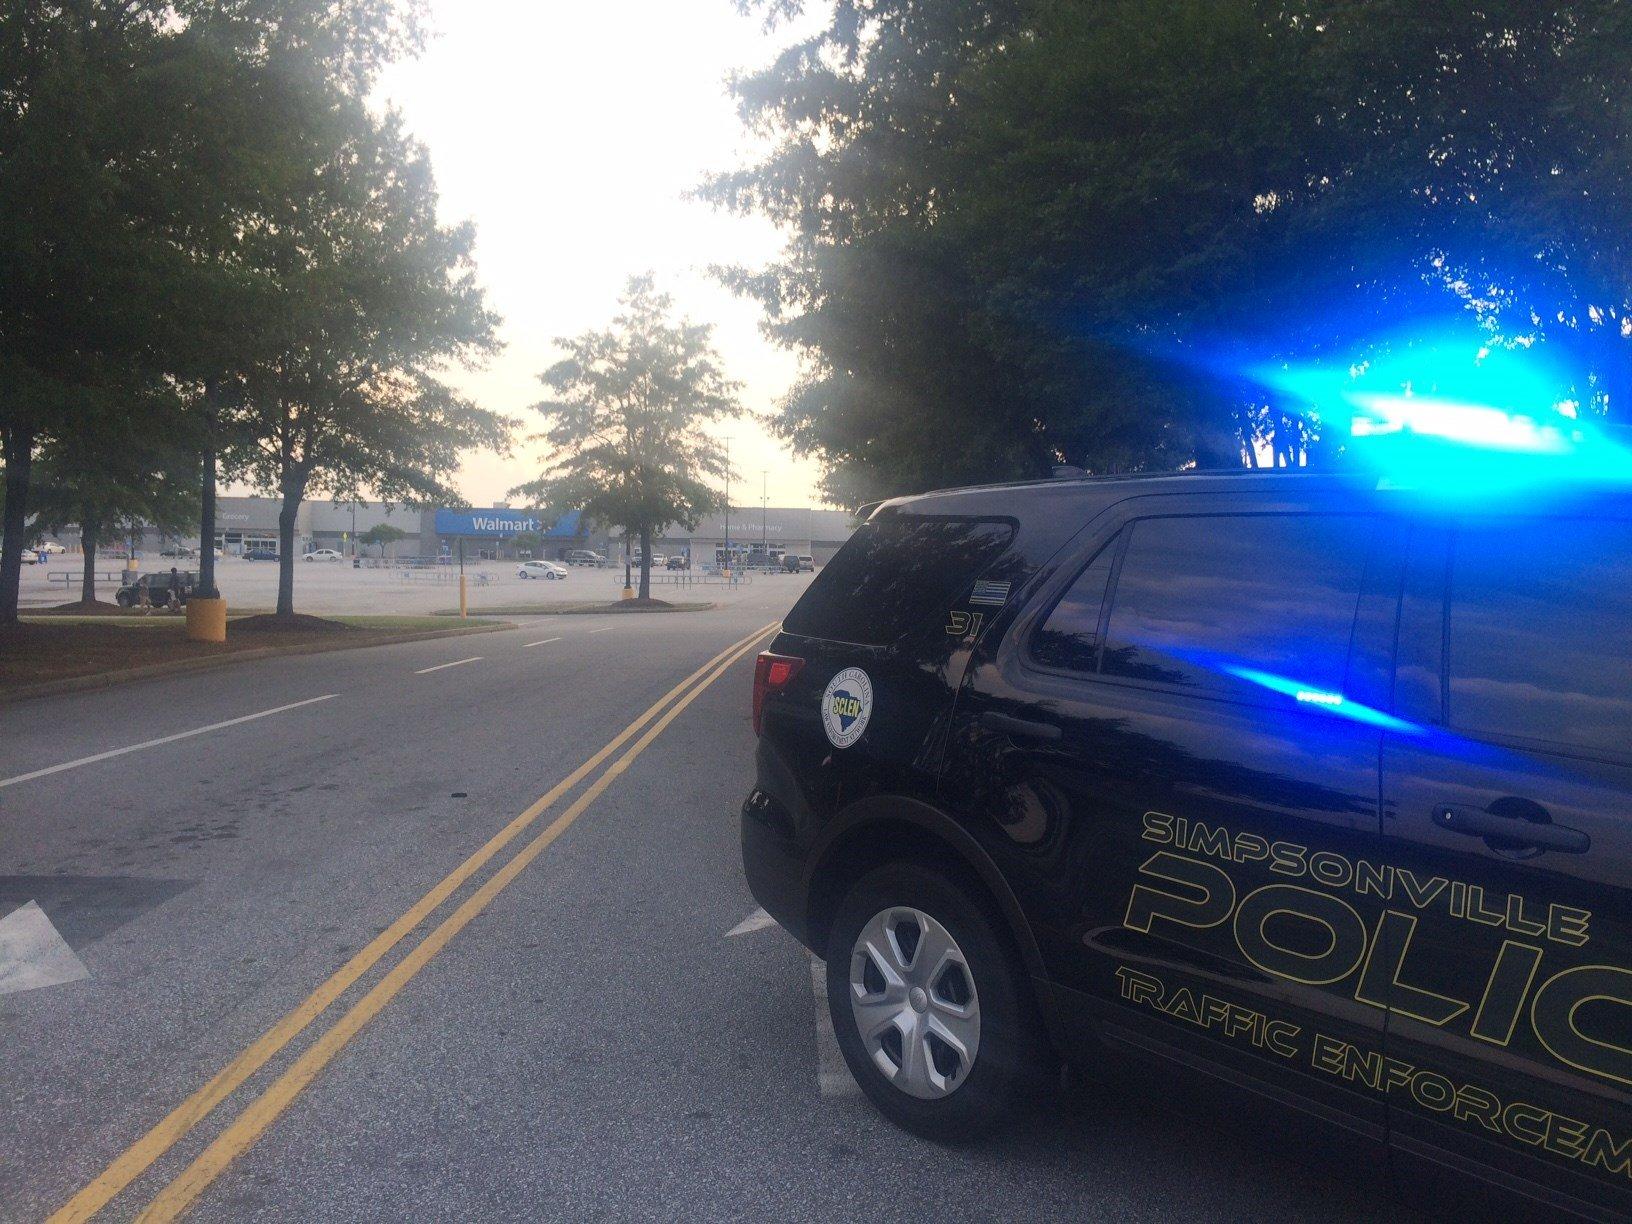 Police on scene at Simpsonville Walmart (July 25, 2017/FOX Carolina)